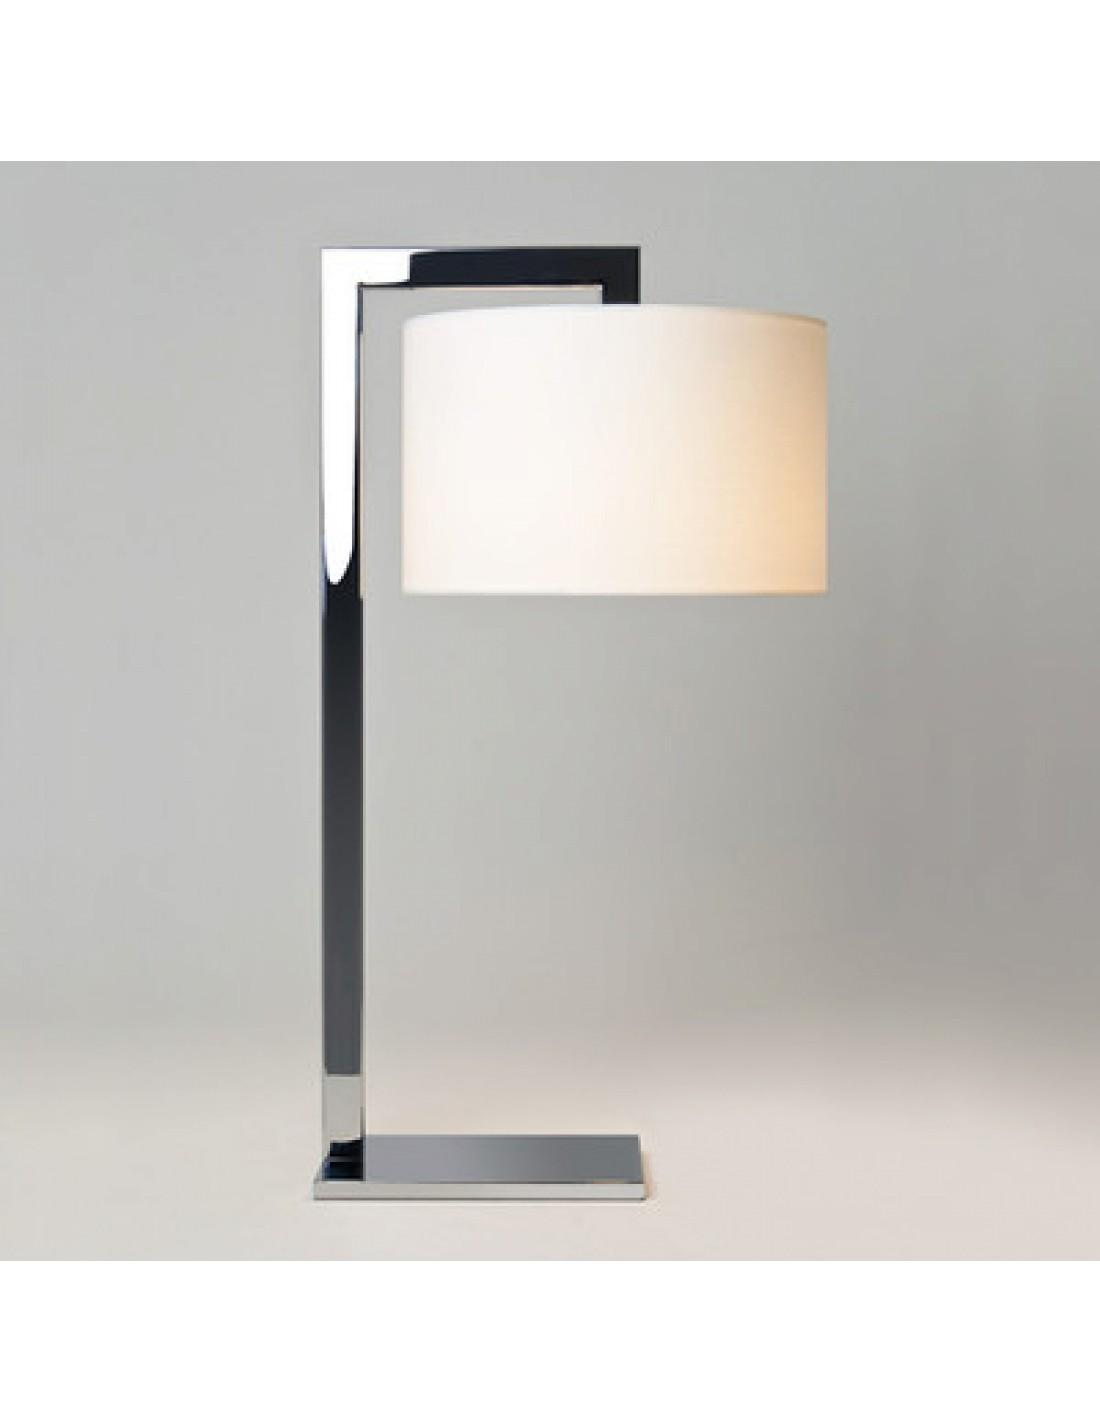 lampe de table ravello chrome et abat-jour blanc astro lighting Valente Design